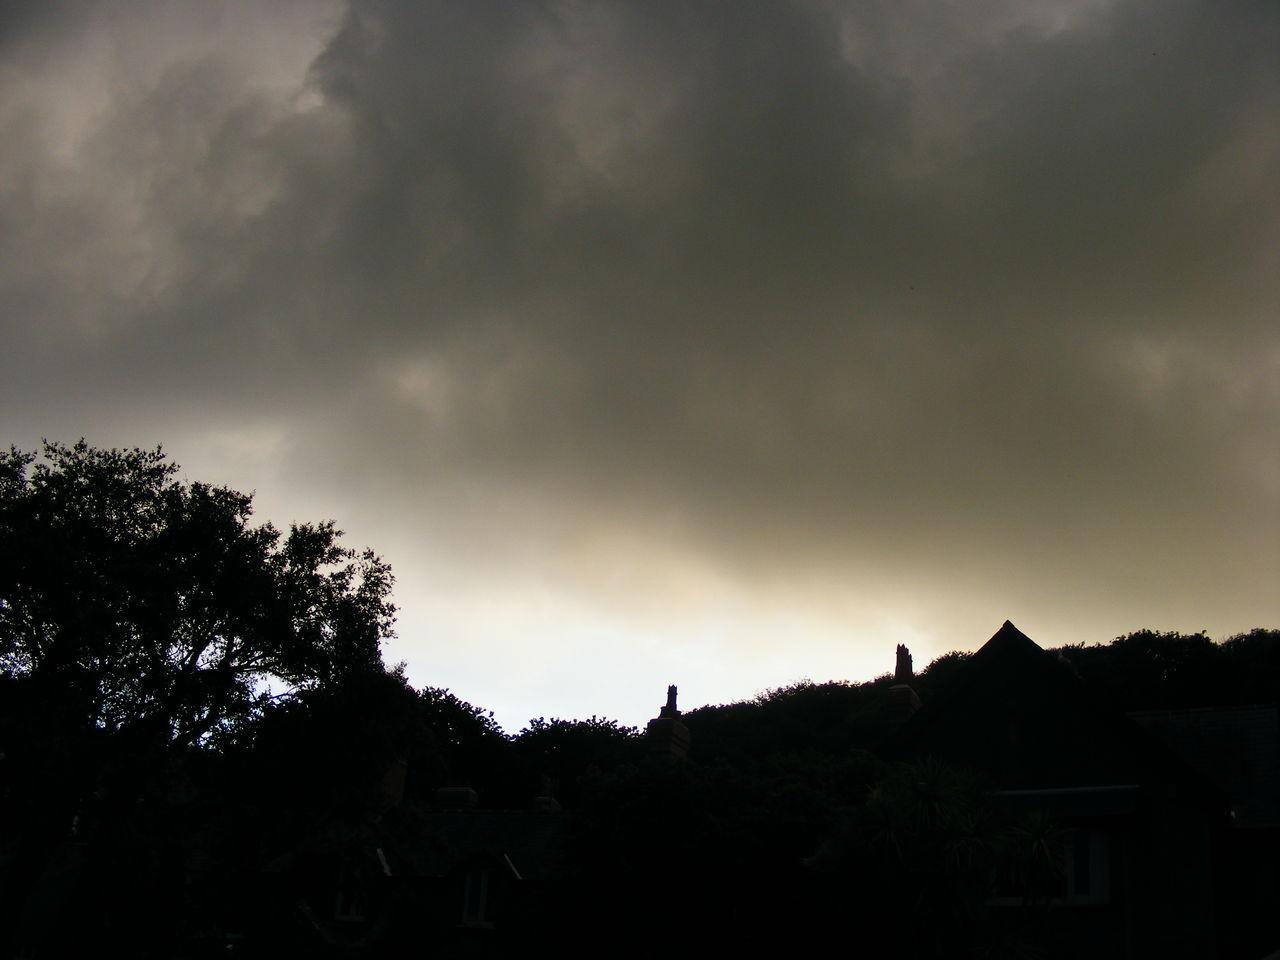 Beauty In Nature Cloud - Sky Clouds Clouds & Sky Clouds And Sky Nature Silhouette Silhouette Photography Sillhouette Photography Sky Sky And Clouds South Wales South Wales Coast Storm Storm Cloud Storm Clouds Storm Clouds Gathering Stormy Weather Tenby Tenby, Pembrokshire